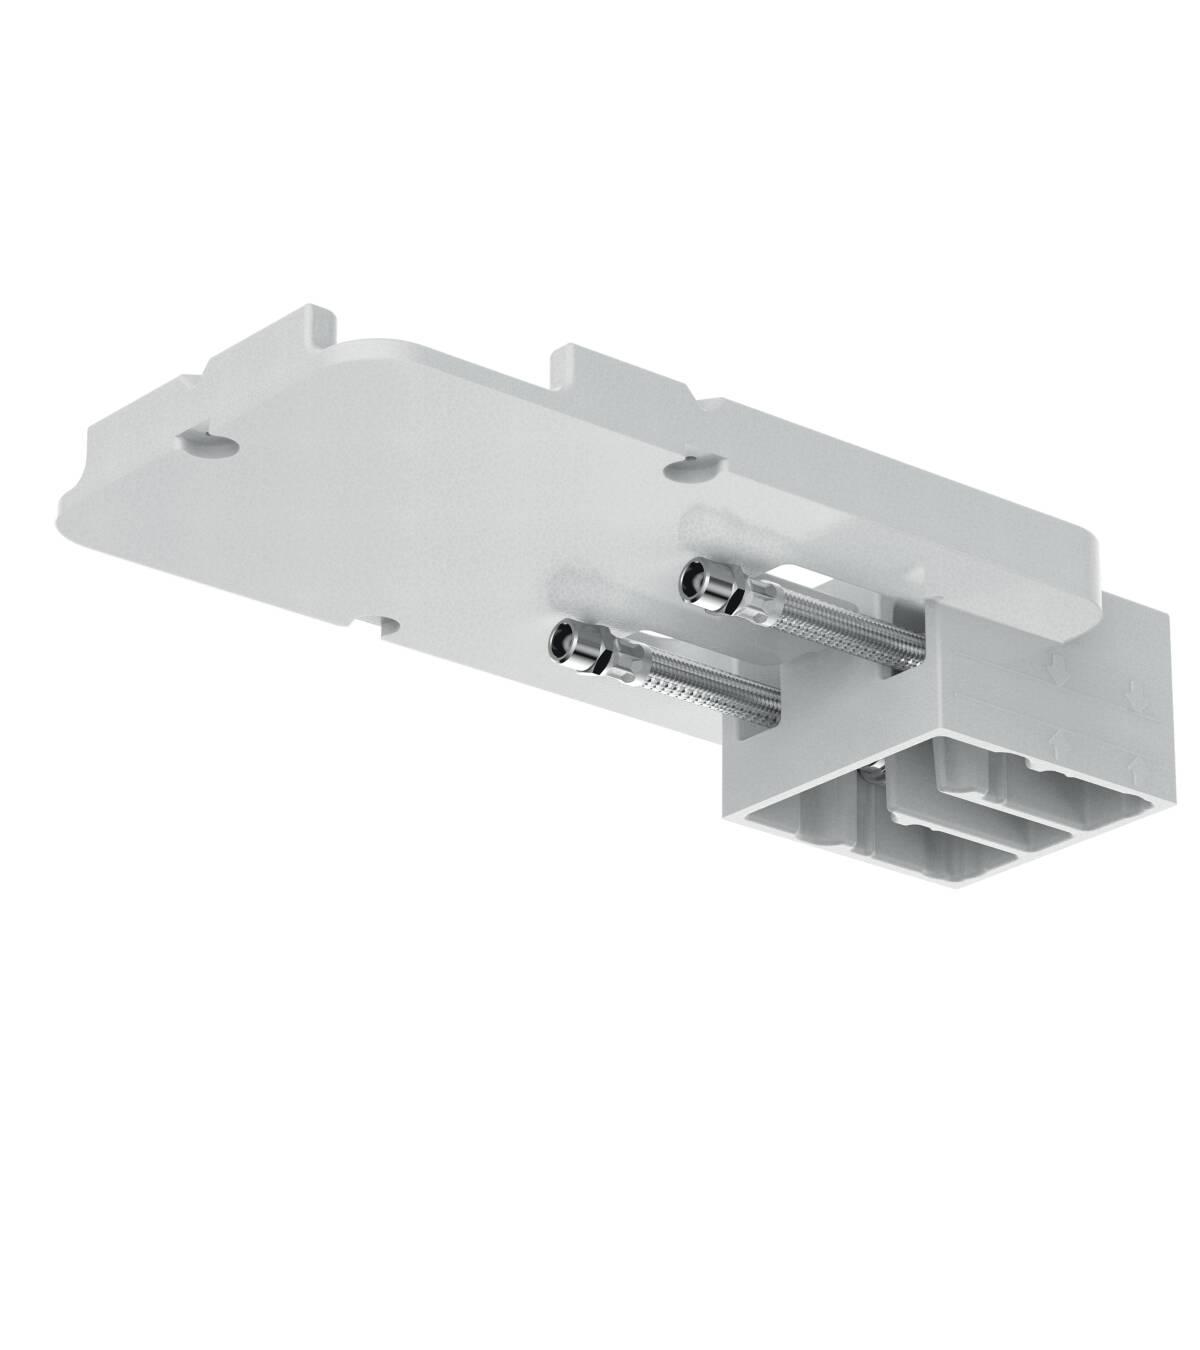 Basic set for overhead shower ceiling, n.a., 35363180